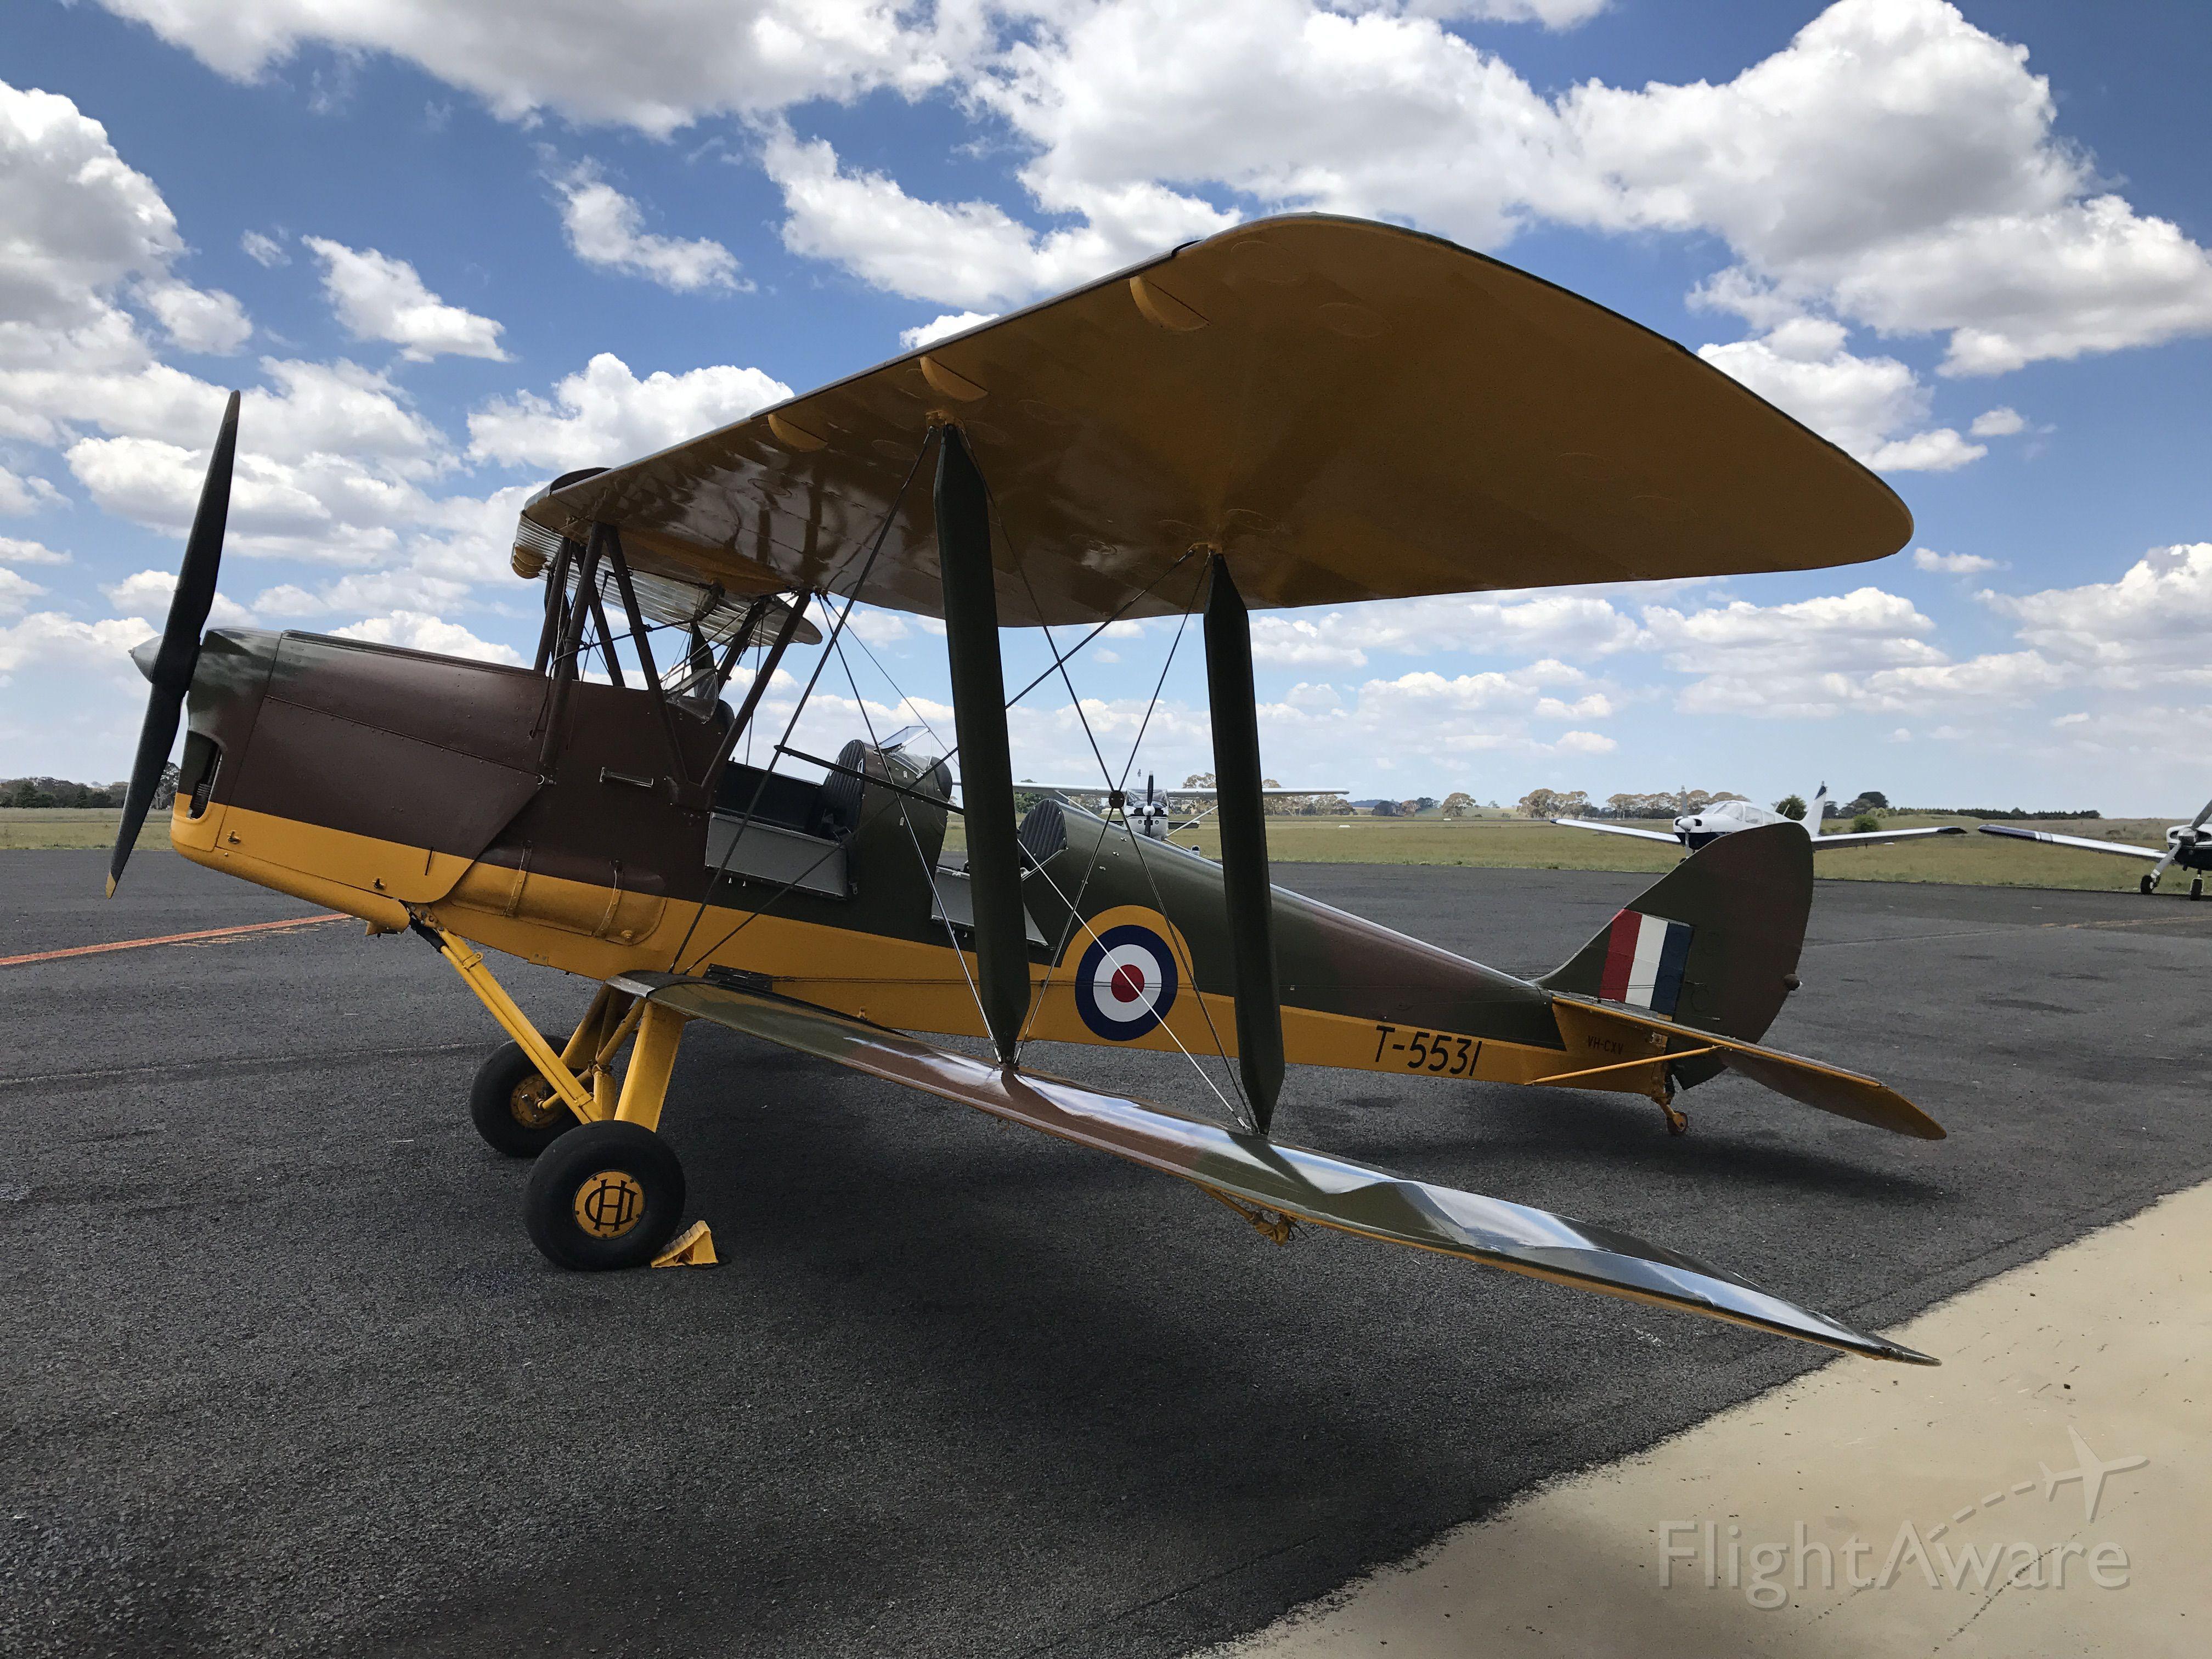 VH-CXV — - Orange Airport, NSW